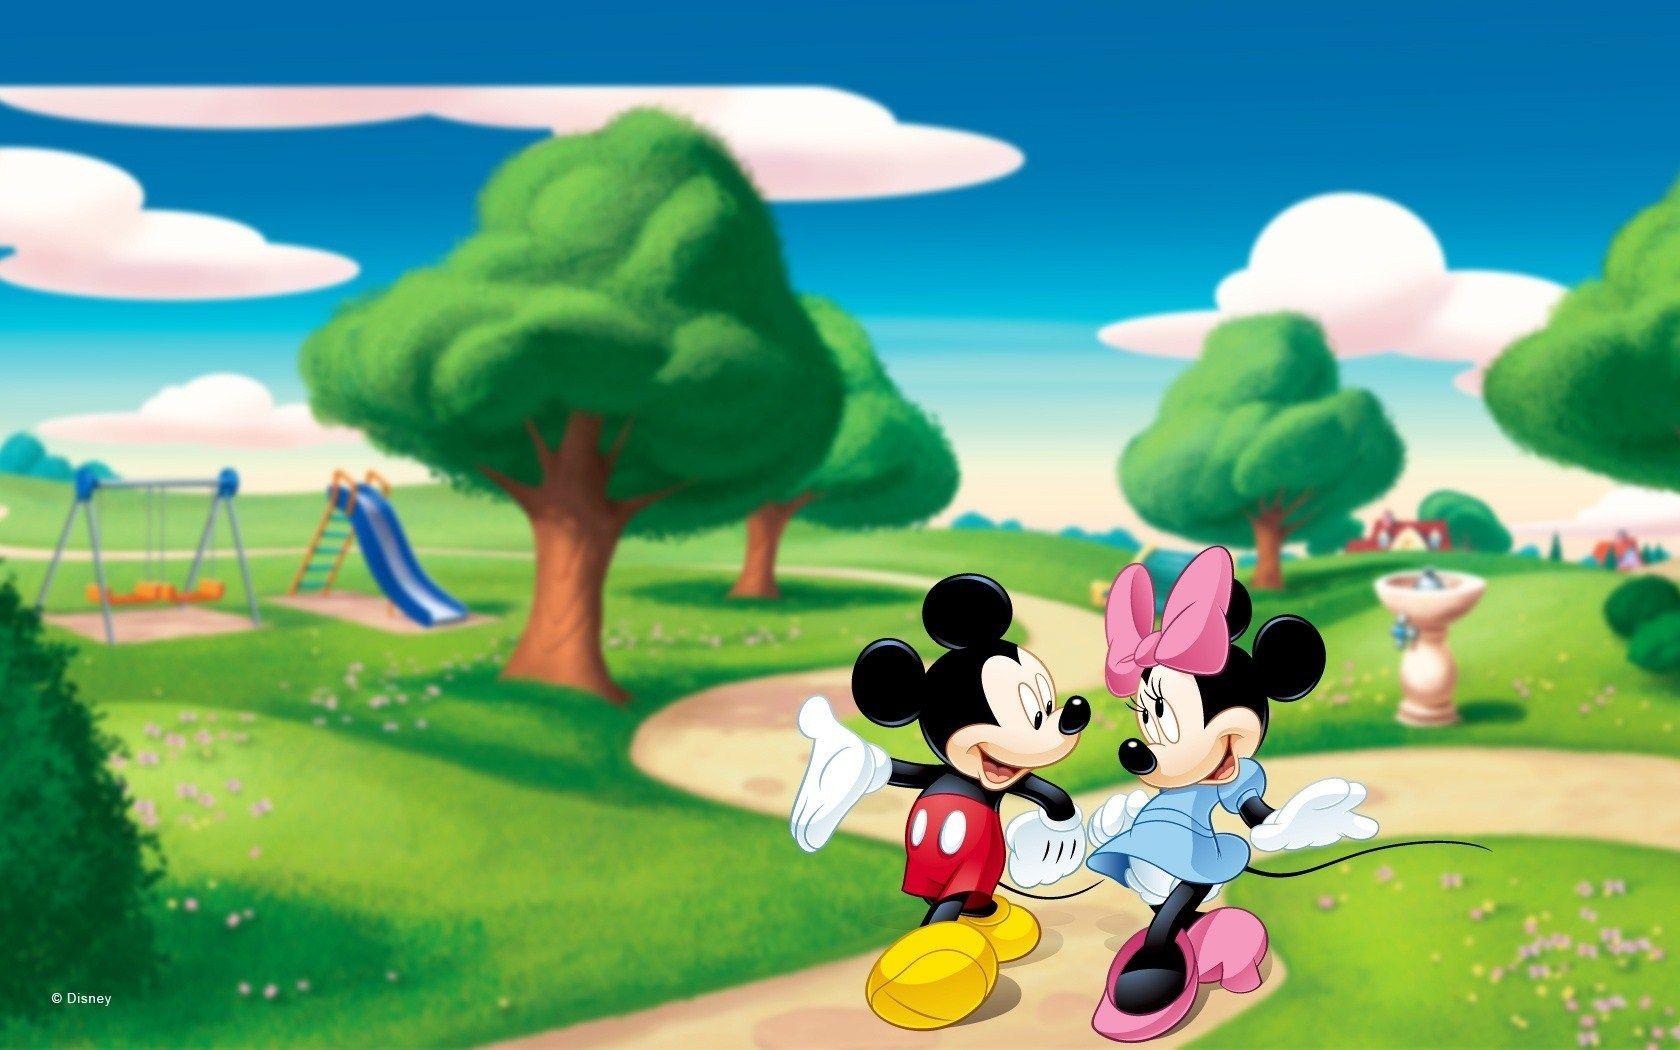 6960013-mickey-mouse-minnie-mouse-disney.jpg (1680×1050)